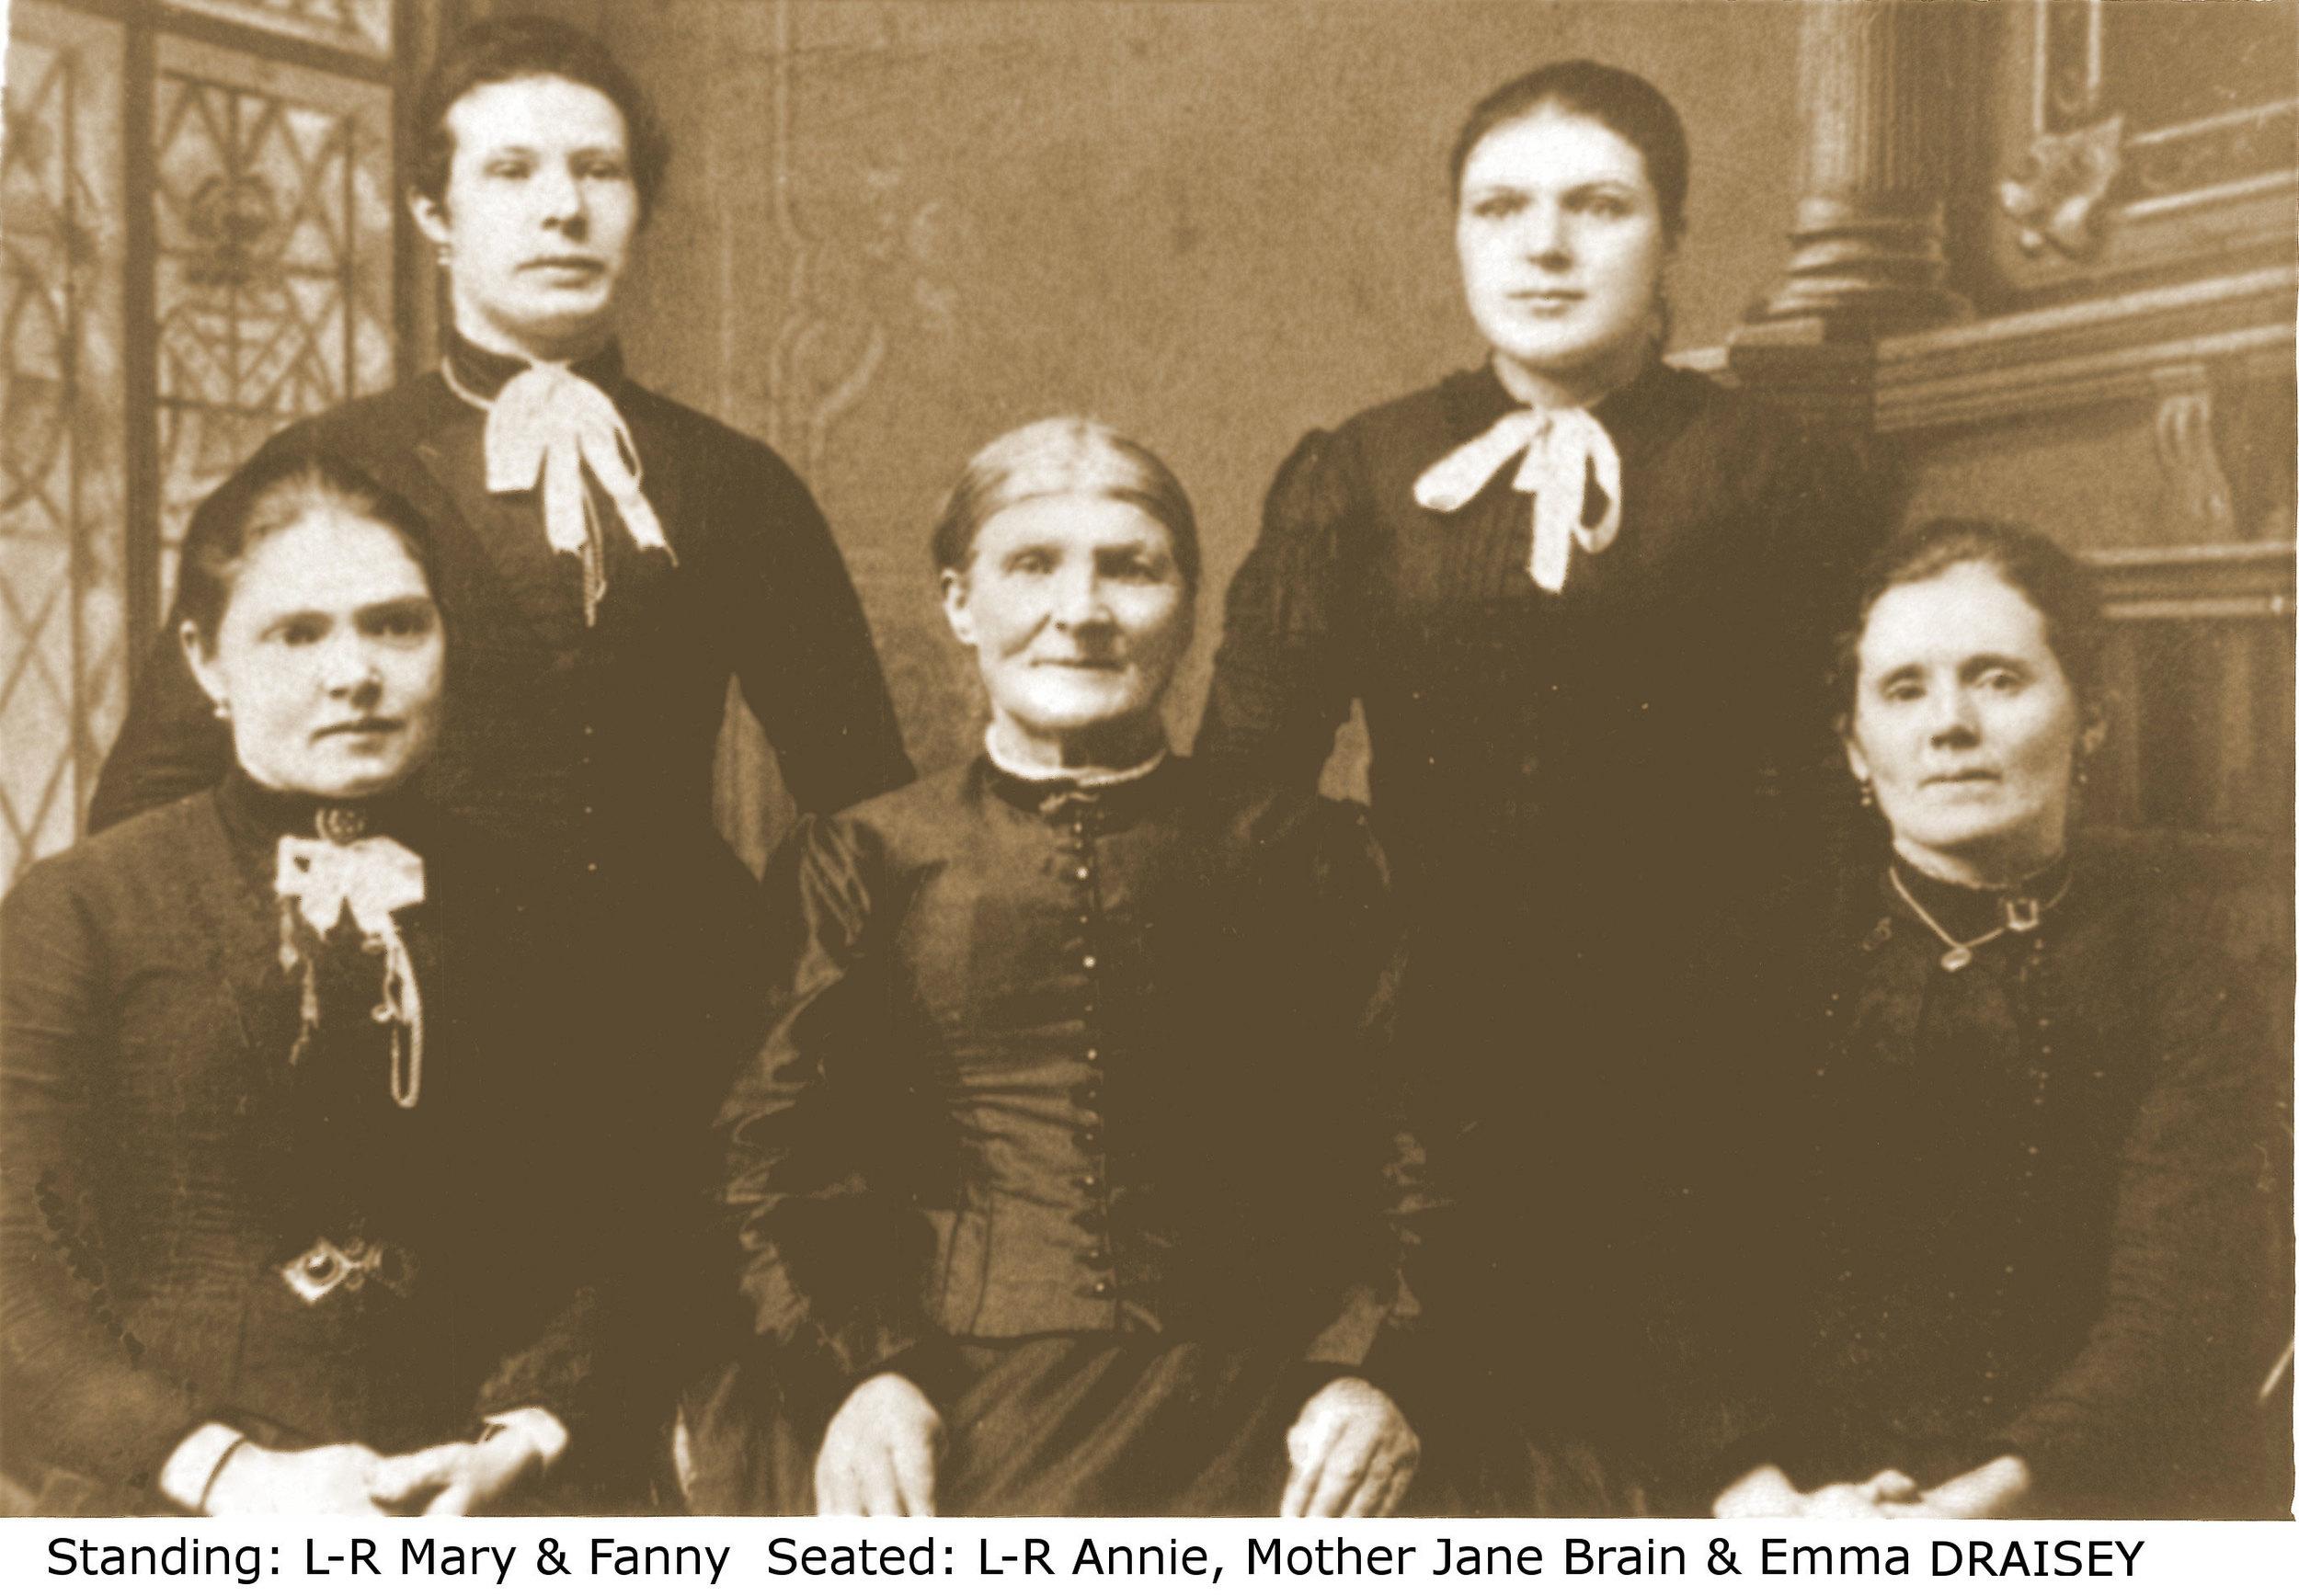 jane-brain-draisey-and-daughters